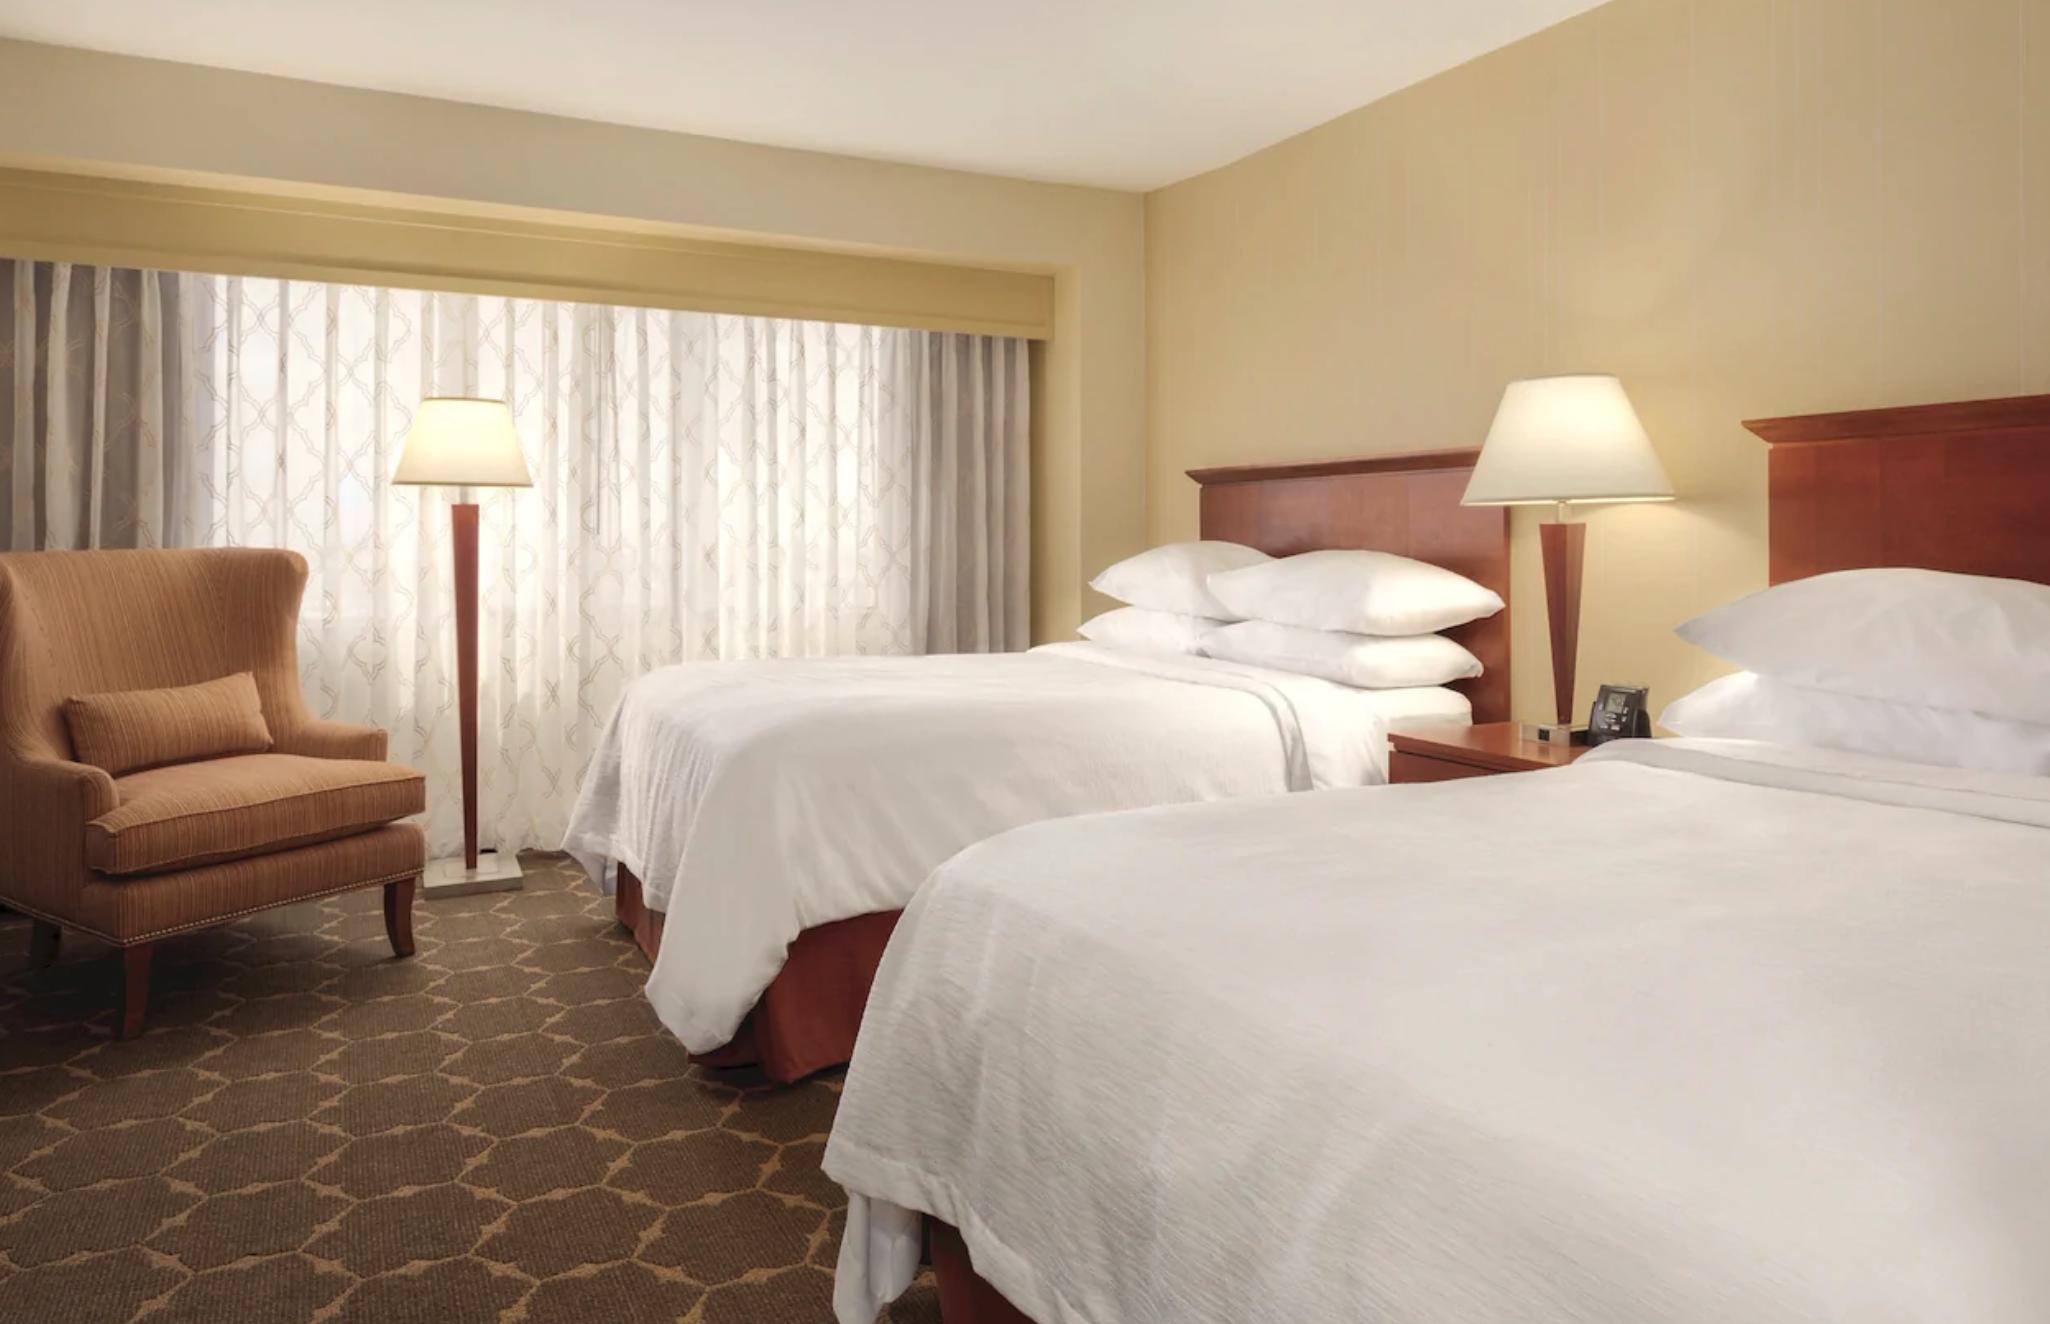 https://www.hotelsbyday.com/_data/default-hotel_image/4/20496/screenshot-2020-08-13-at-1-28-12-pm.png